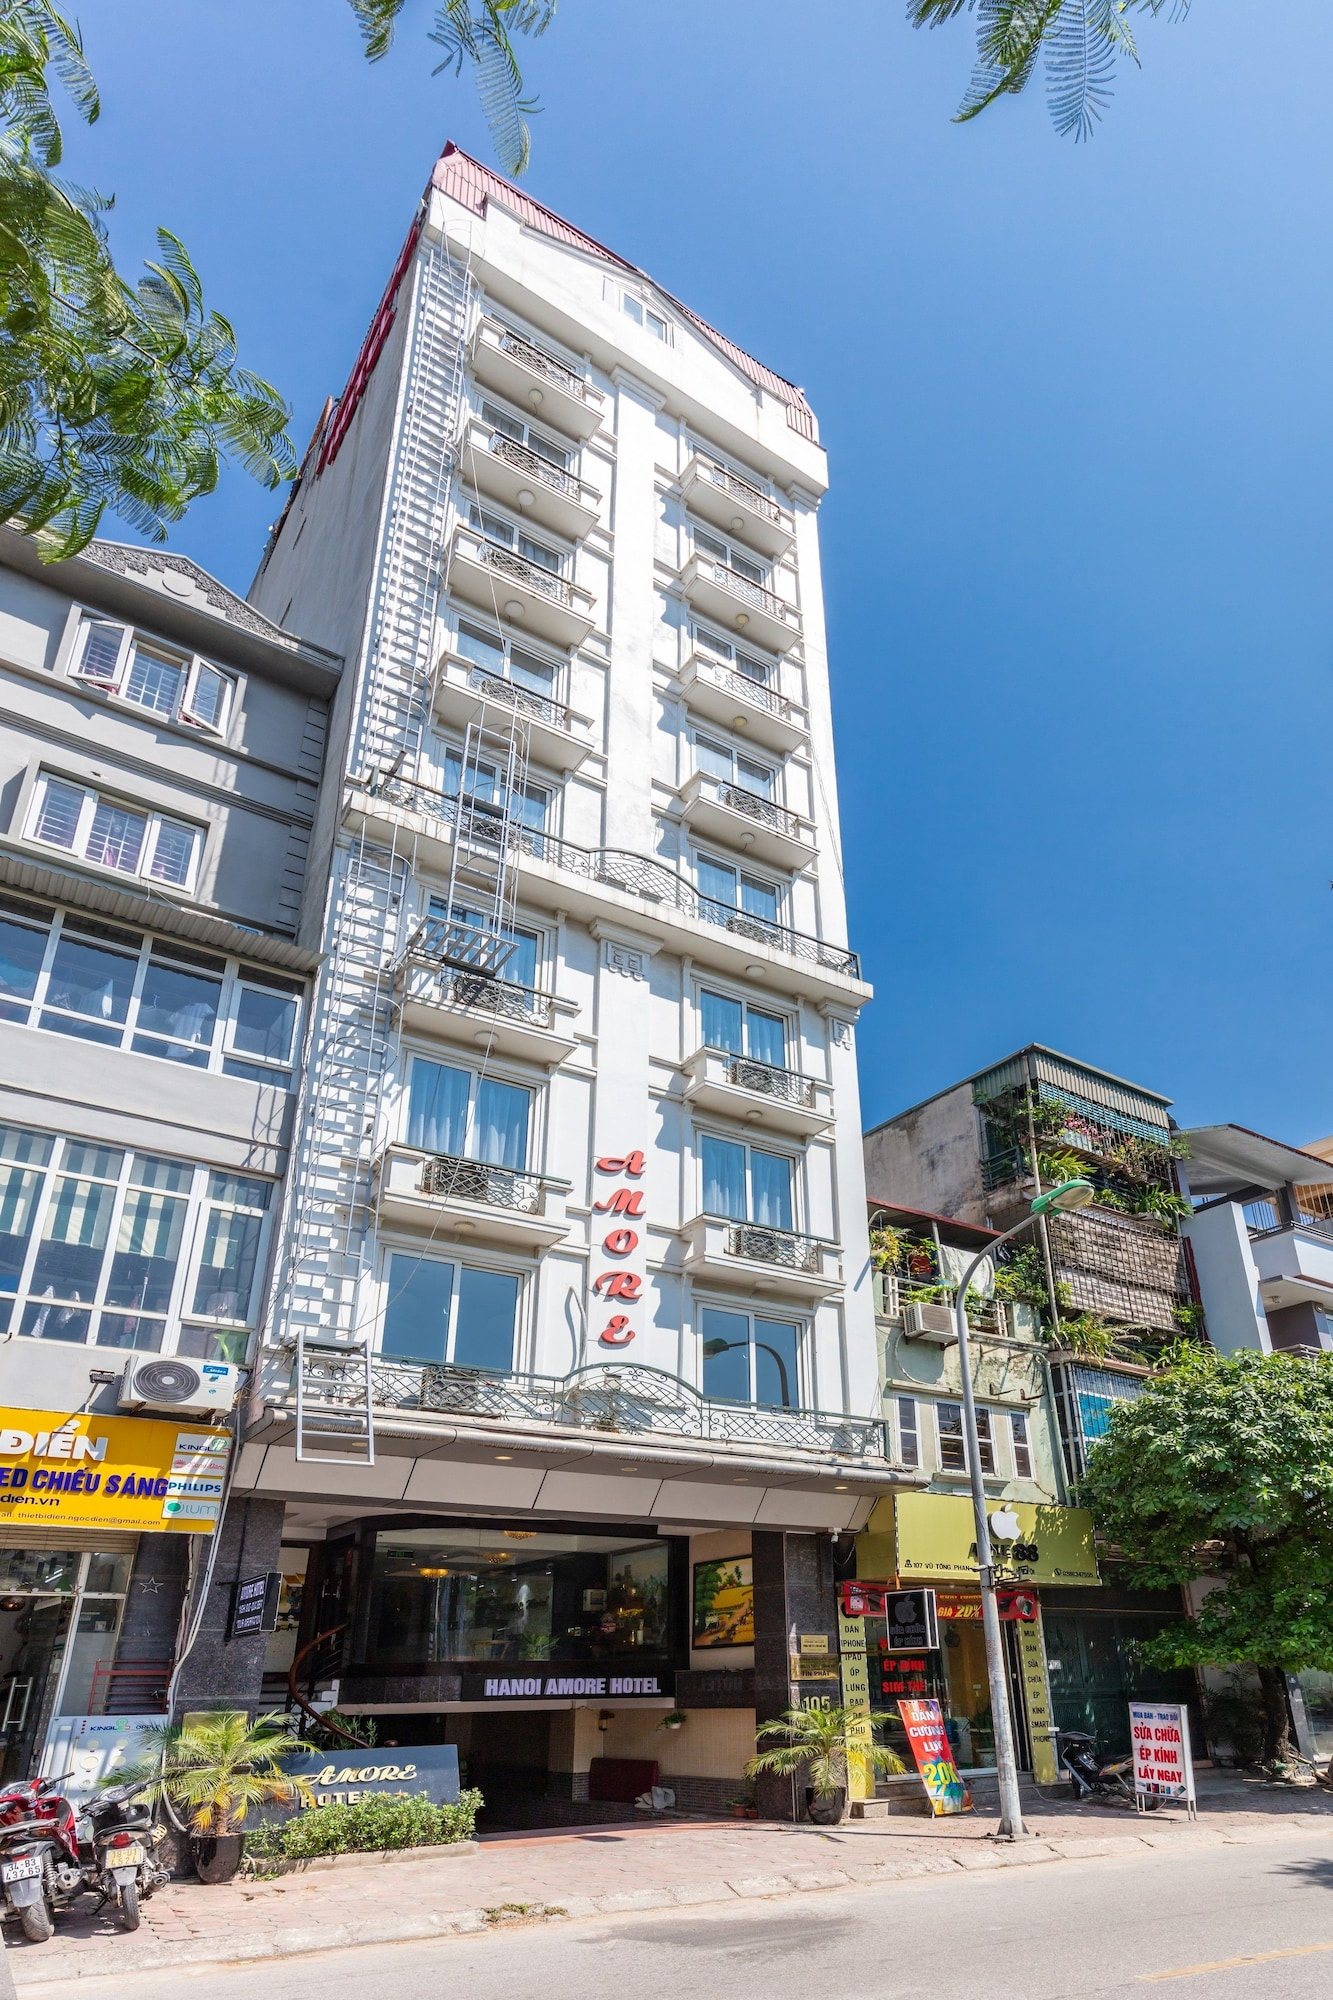 Hanoi Amore Hotel & Travel, Thanh Xuân